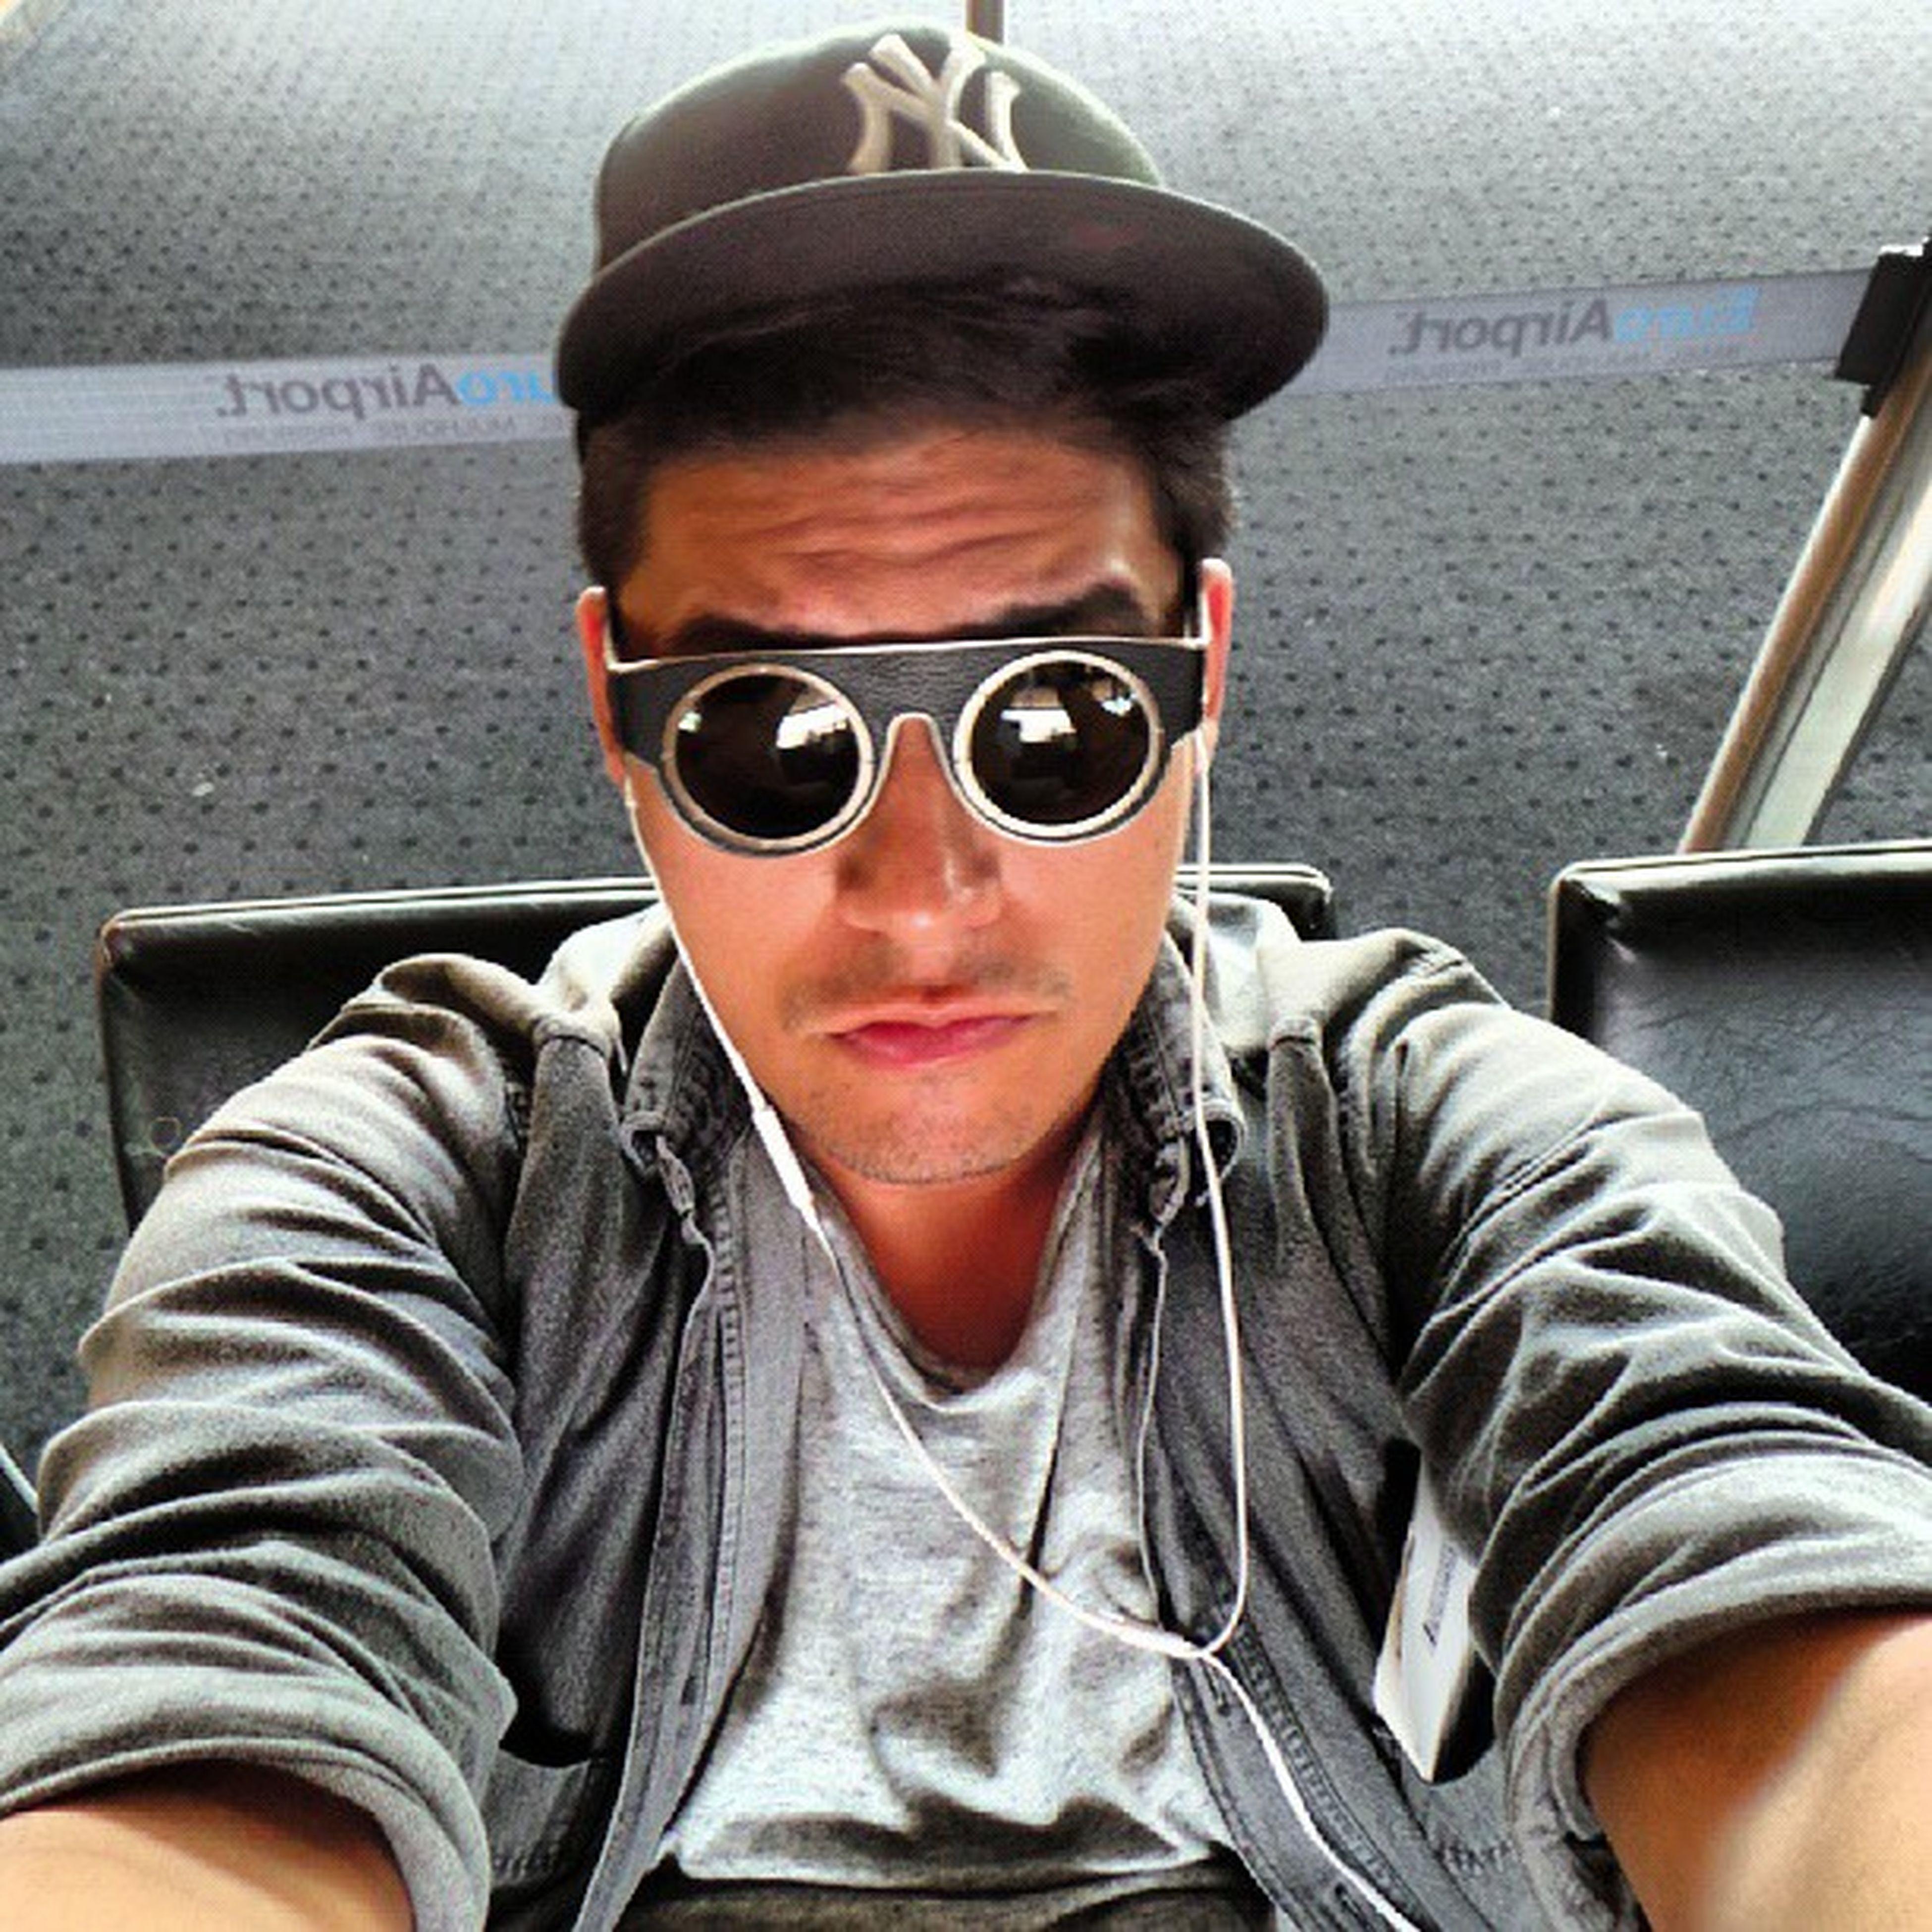 Not impressed with Basel Airport selfie!!! HateThisAirport BaselSucks Selfie VainBitch LindaFarrow KTZ Igers PandaGoingHome